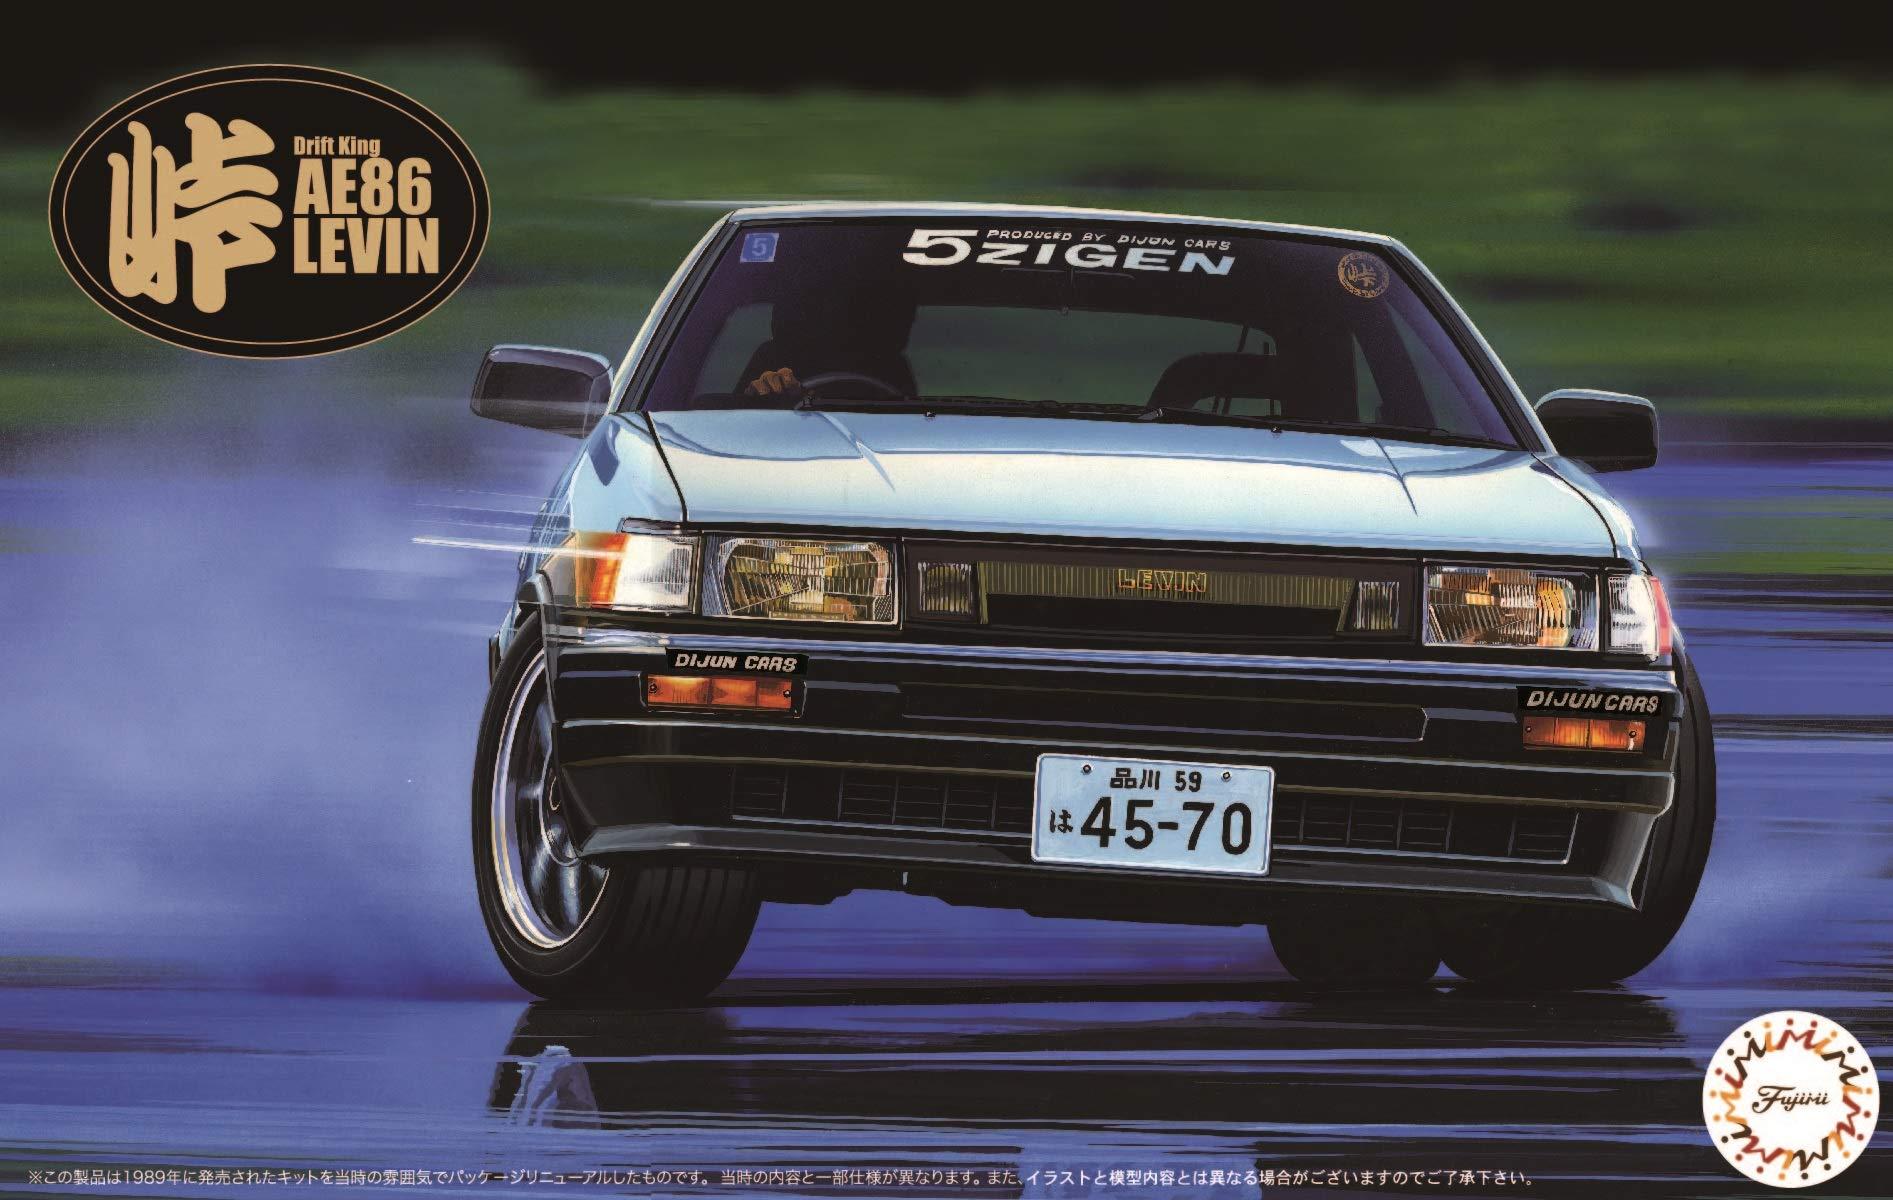 Fujimi Toyota AE86 Levin